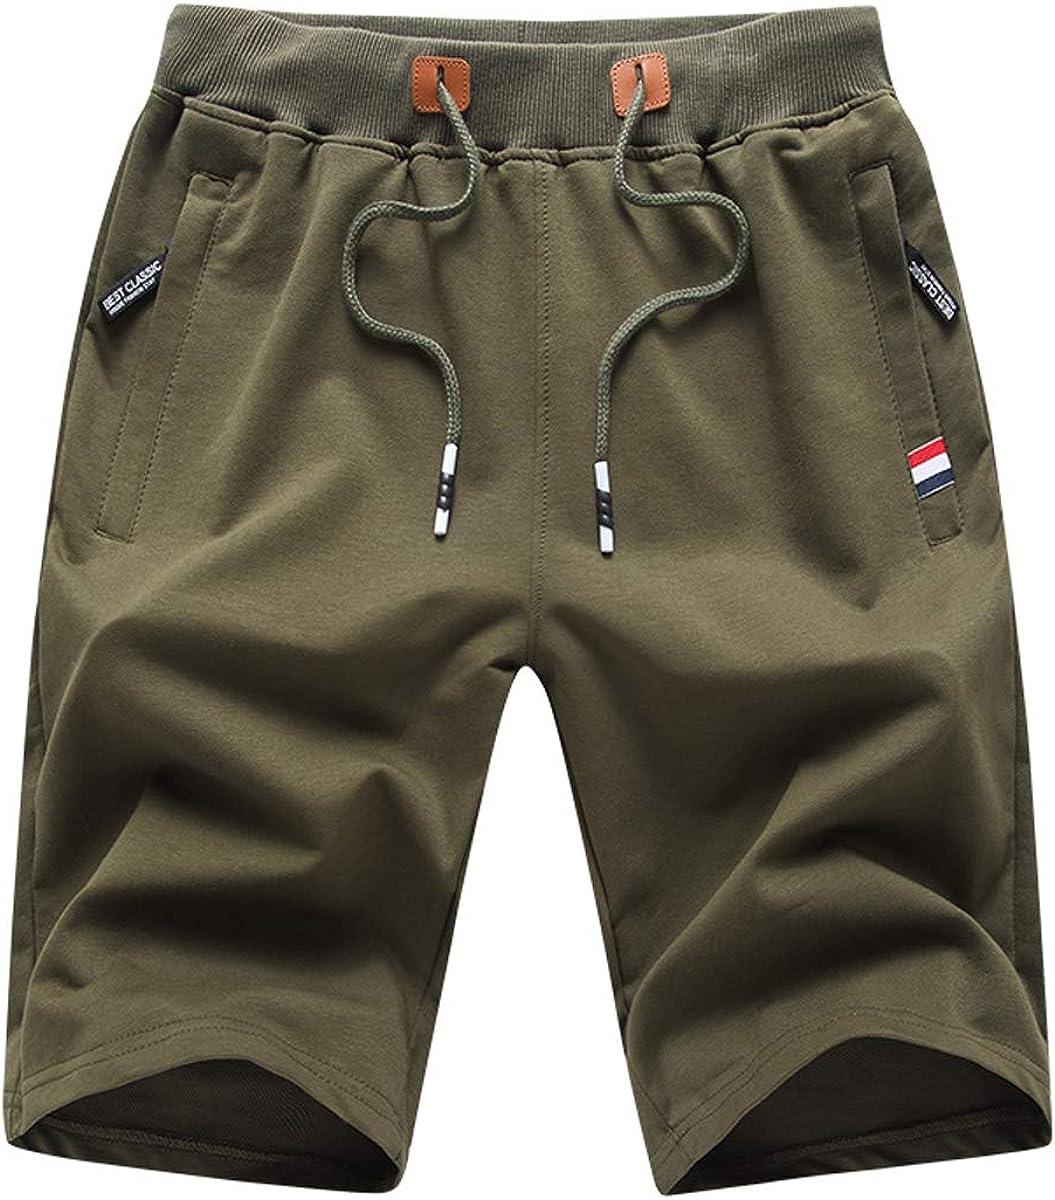 JustSun Mens Shorts Max 52% OFF Casual Sports Waist with Max 78% OFF Pock Zipper Elastic